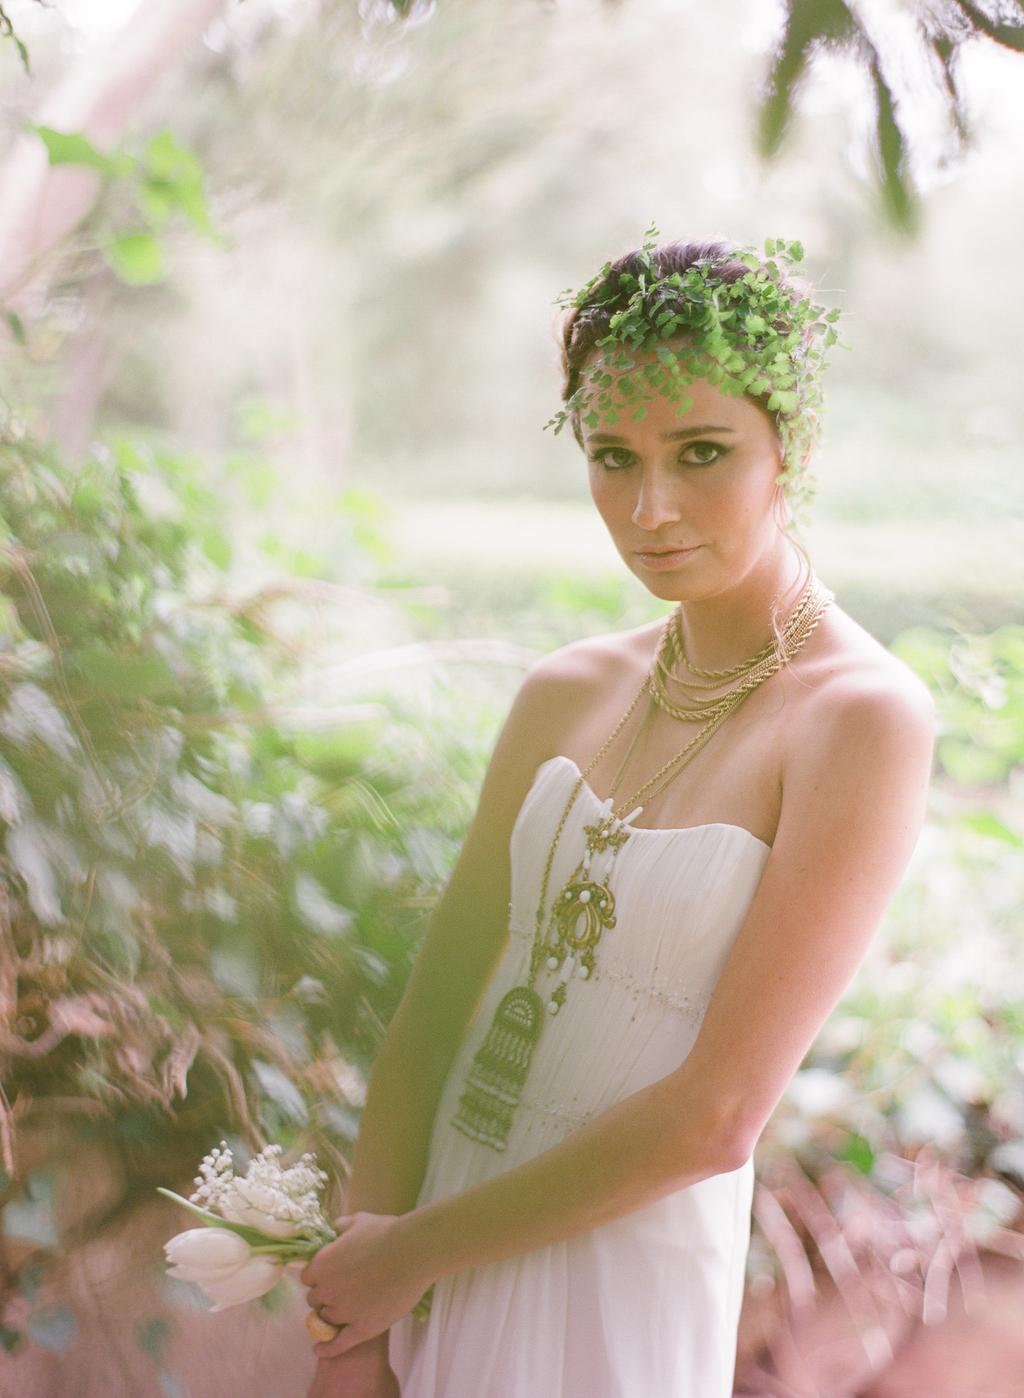 Styled-wedding-santa-barbara-chic-beaux-arts-phtographie-italian-bohemian-wedding-bride-wedding-dress-003.full